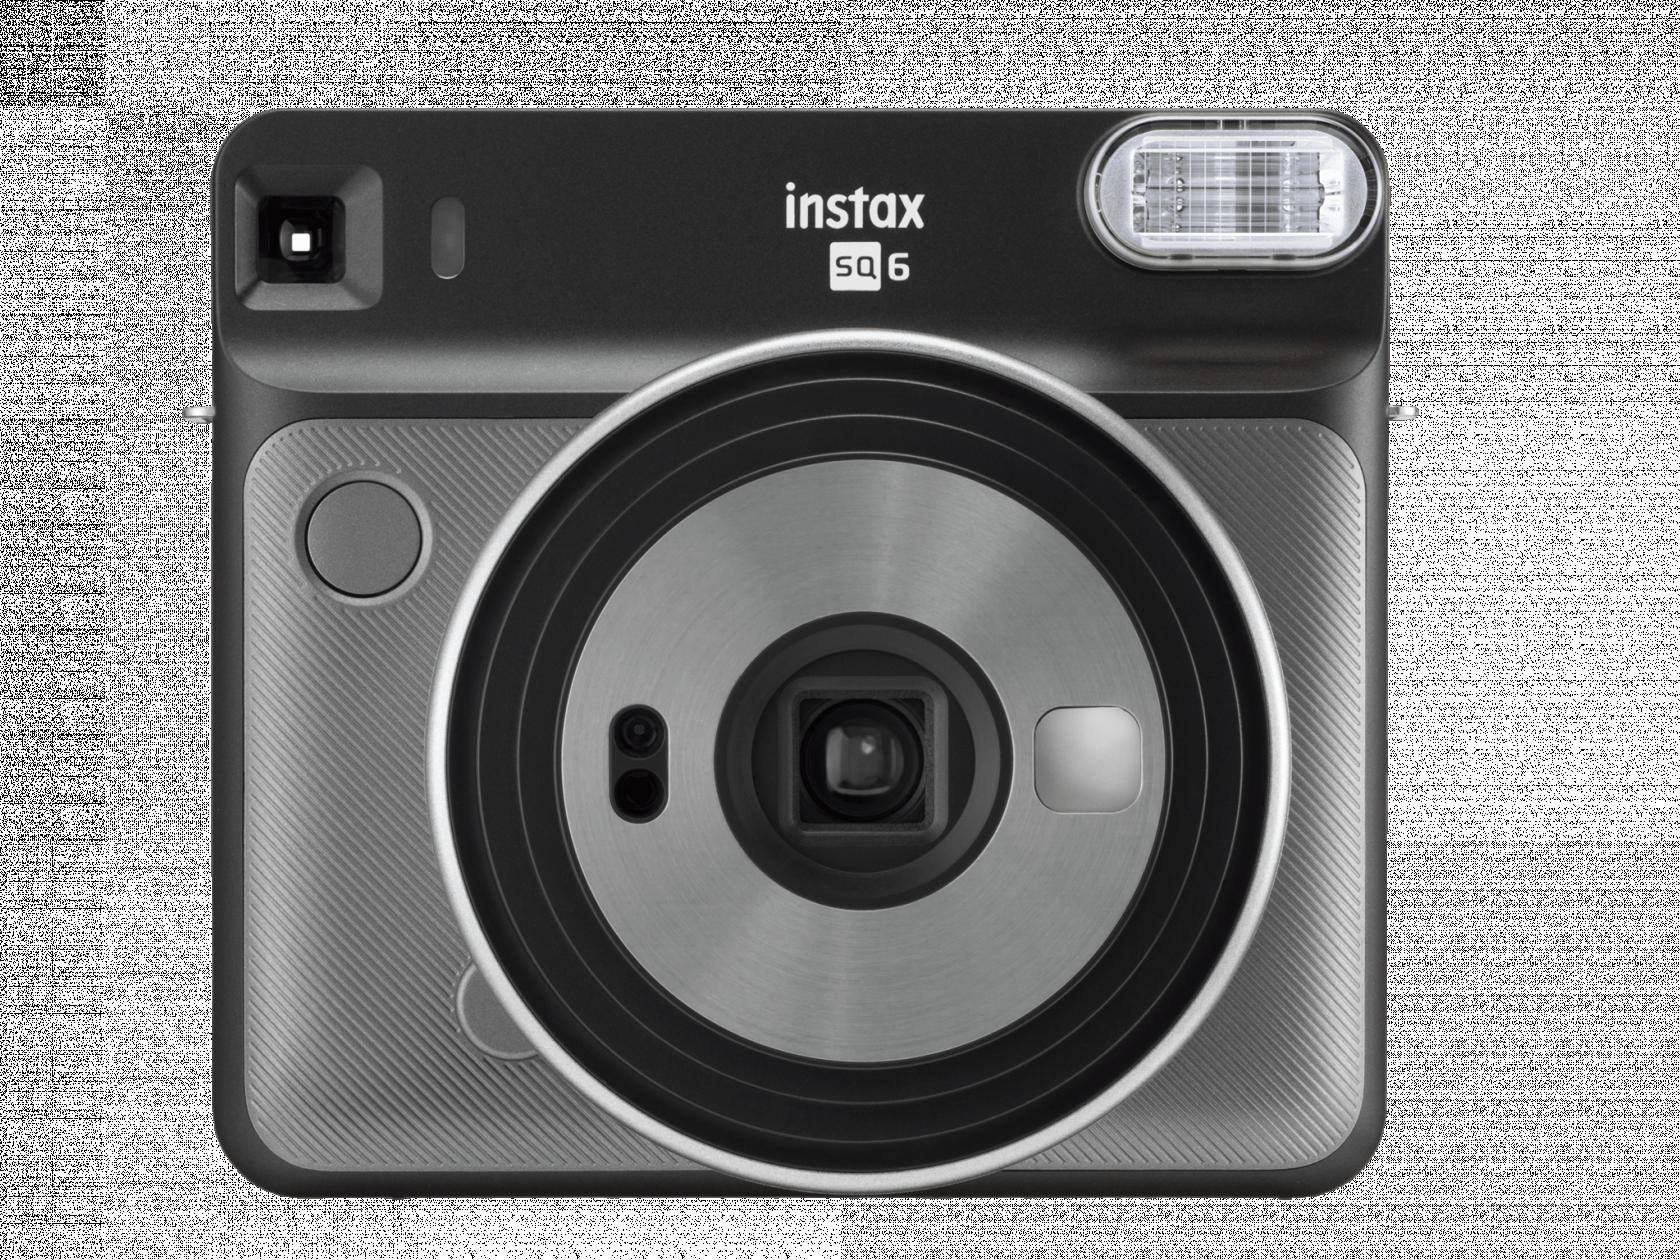 Best Instant Cameras 2019: Fujifilm camera, Polaroid cameras